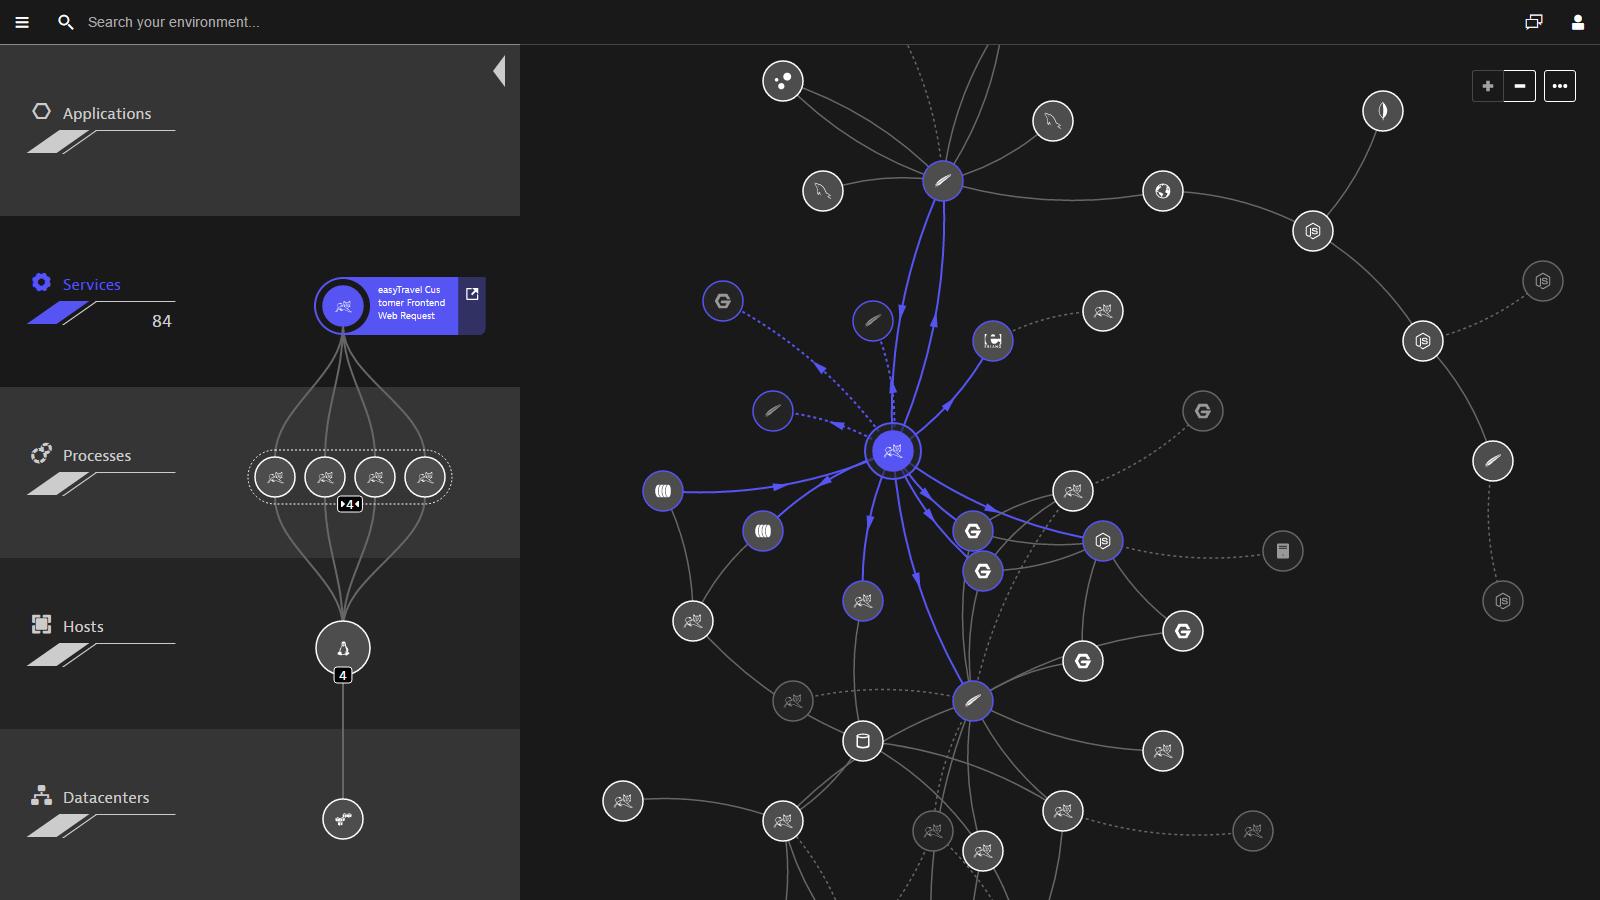 Dynatrace Demo - Smartscape topology map